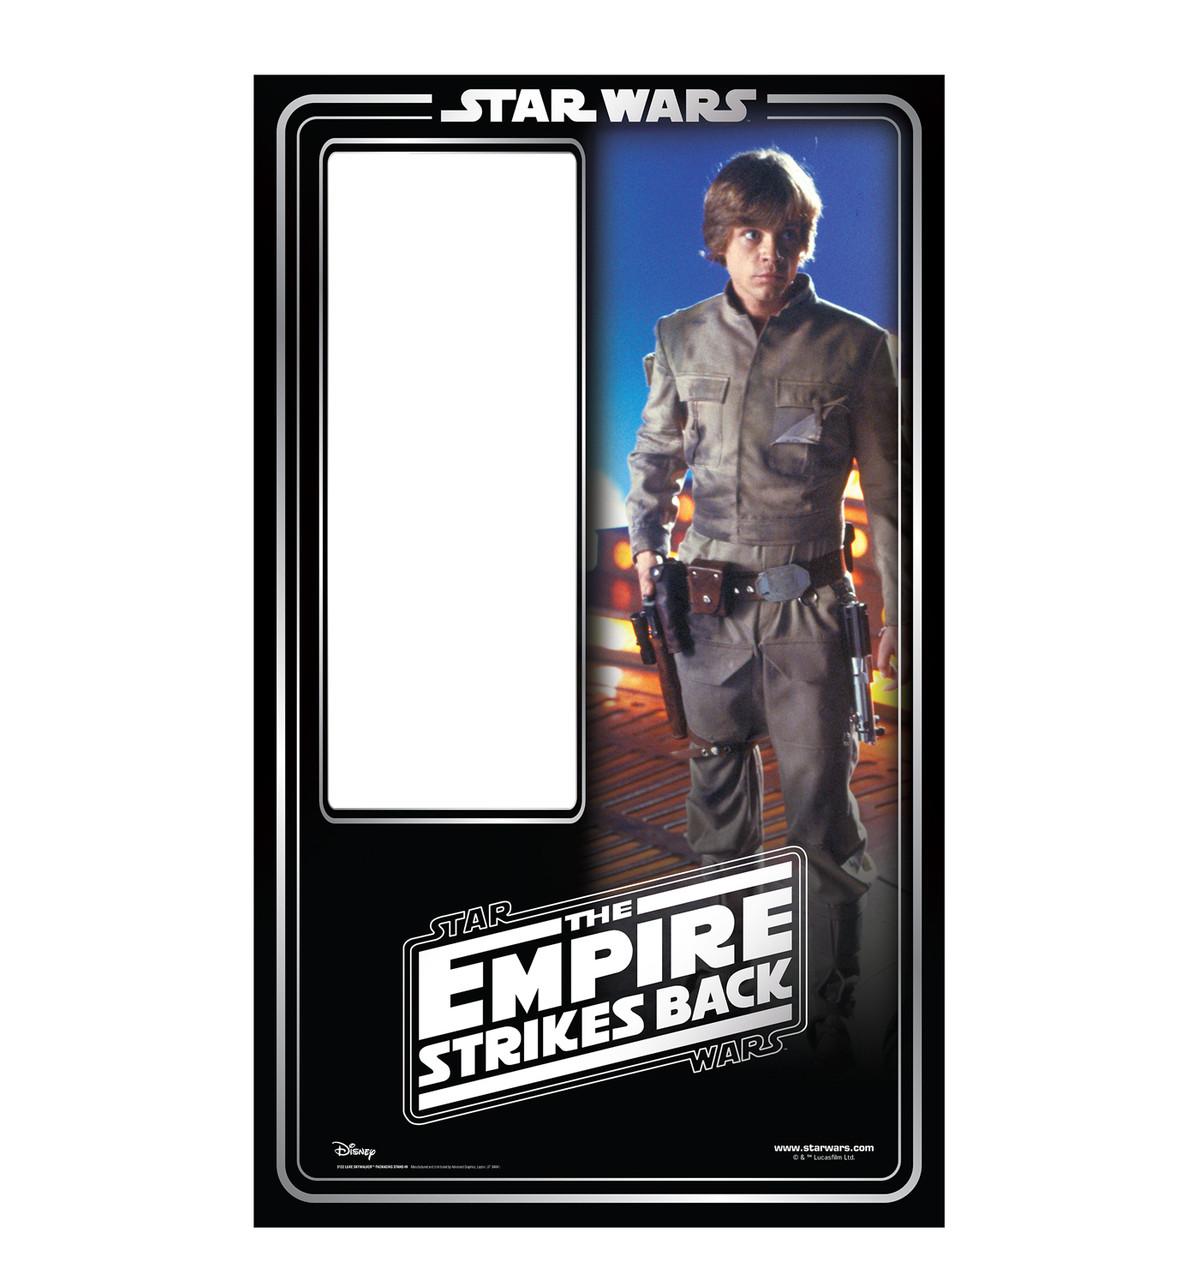 Life-size cardboard standin of Luke Skywalker Packaging. Celebrating 40 years.